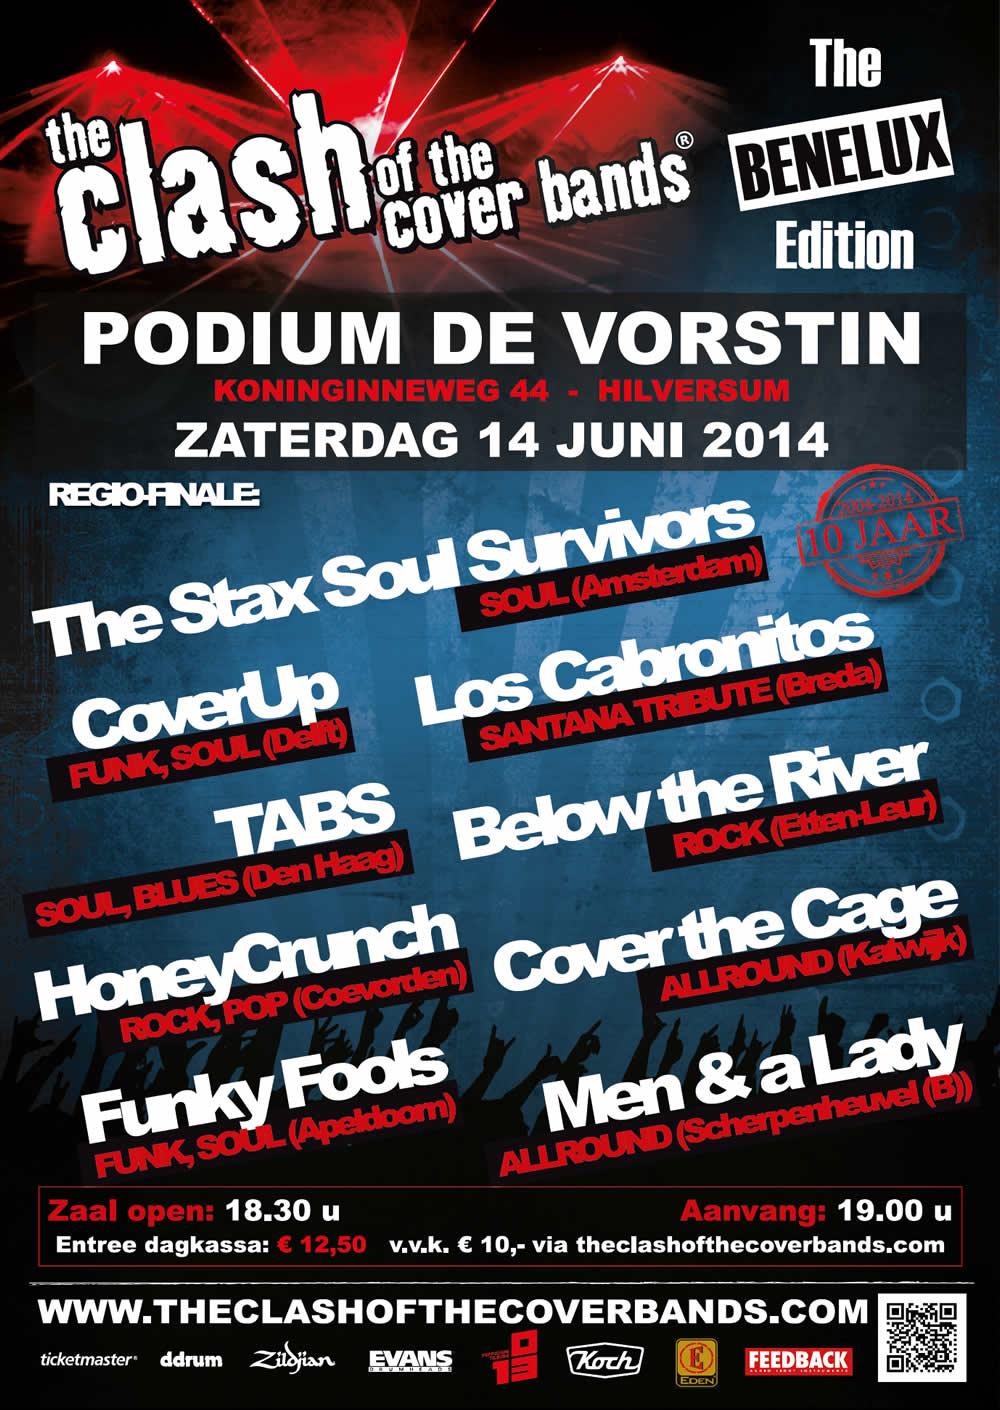 3) Poster_140614_PodiumdeVorstin_Hilversum